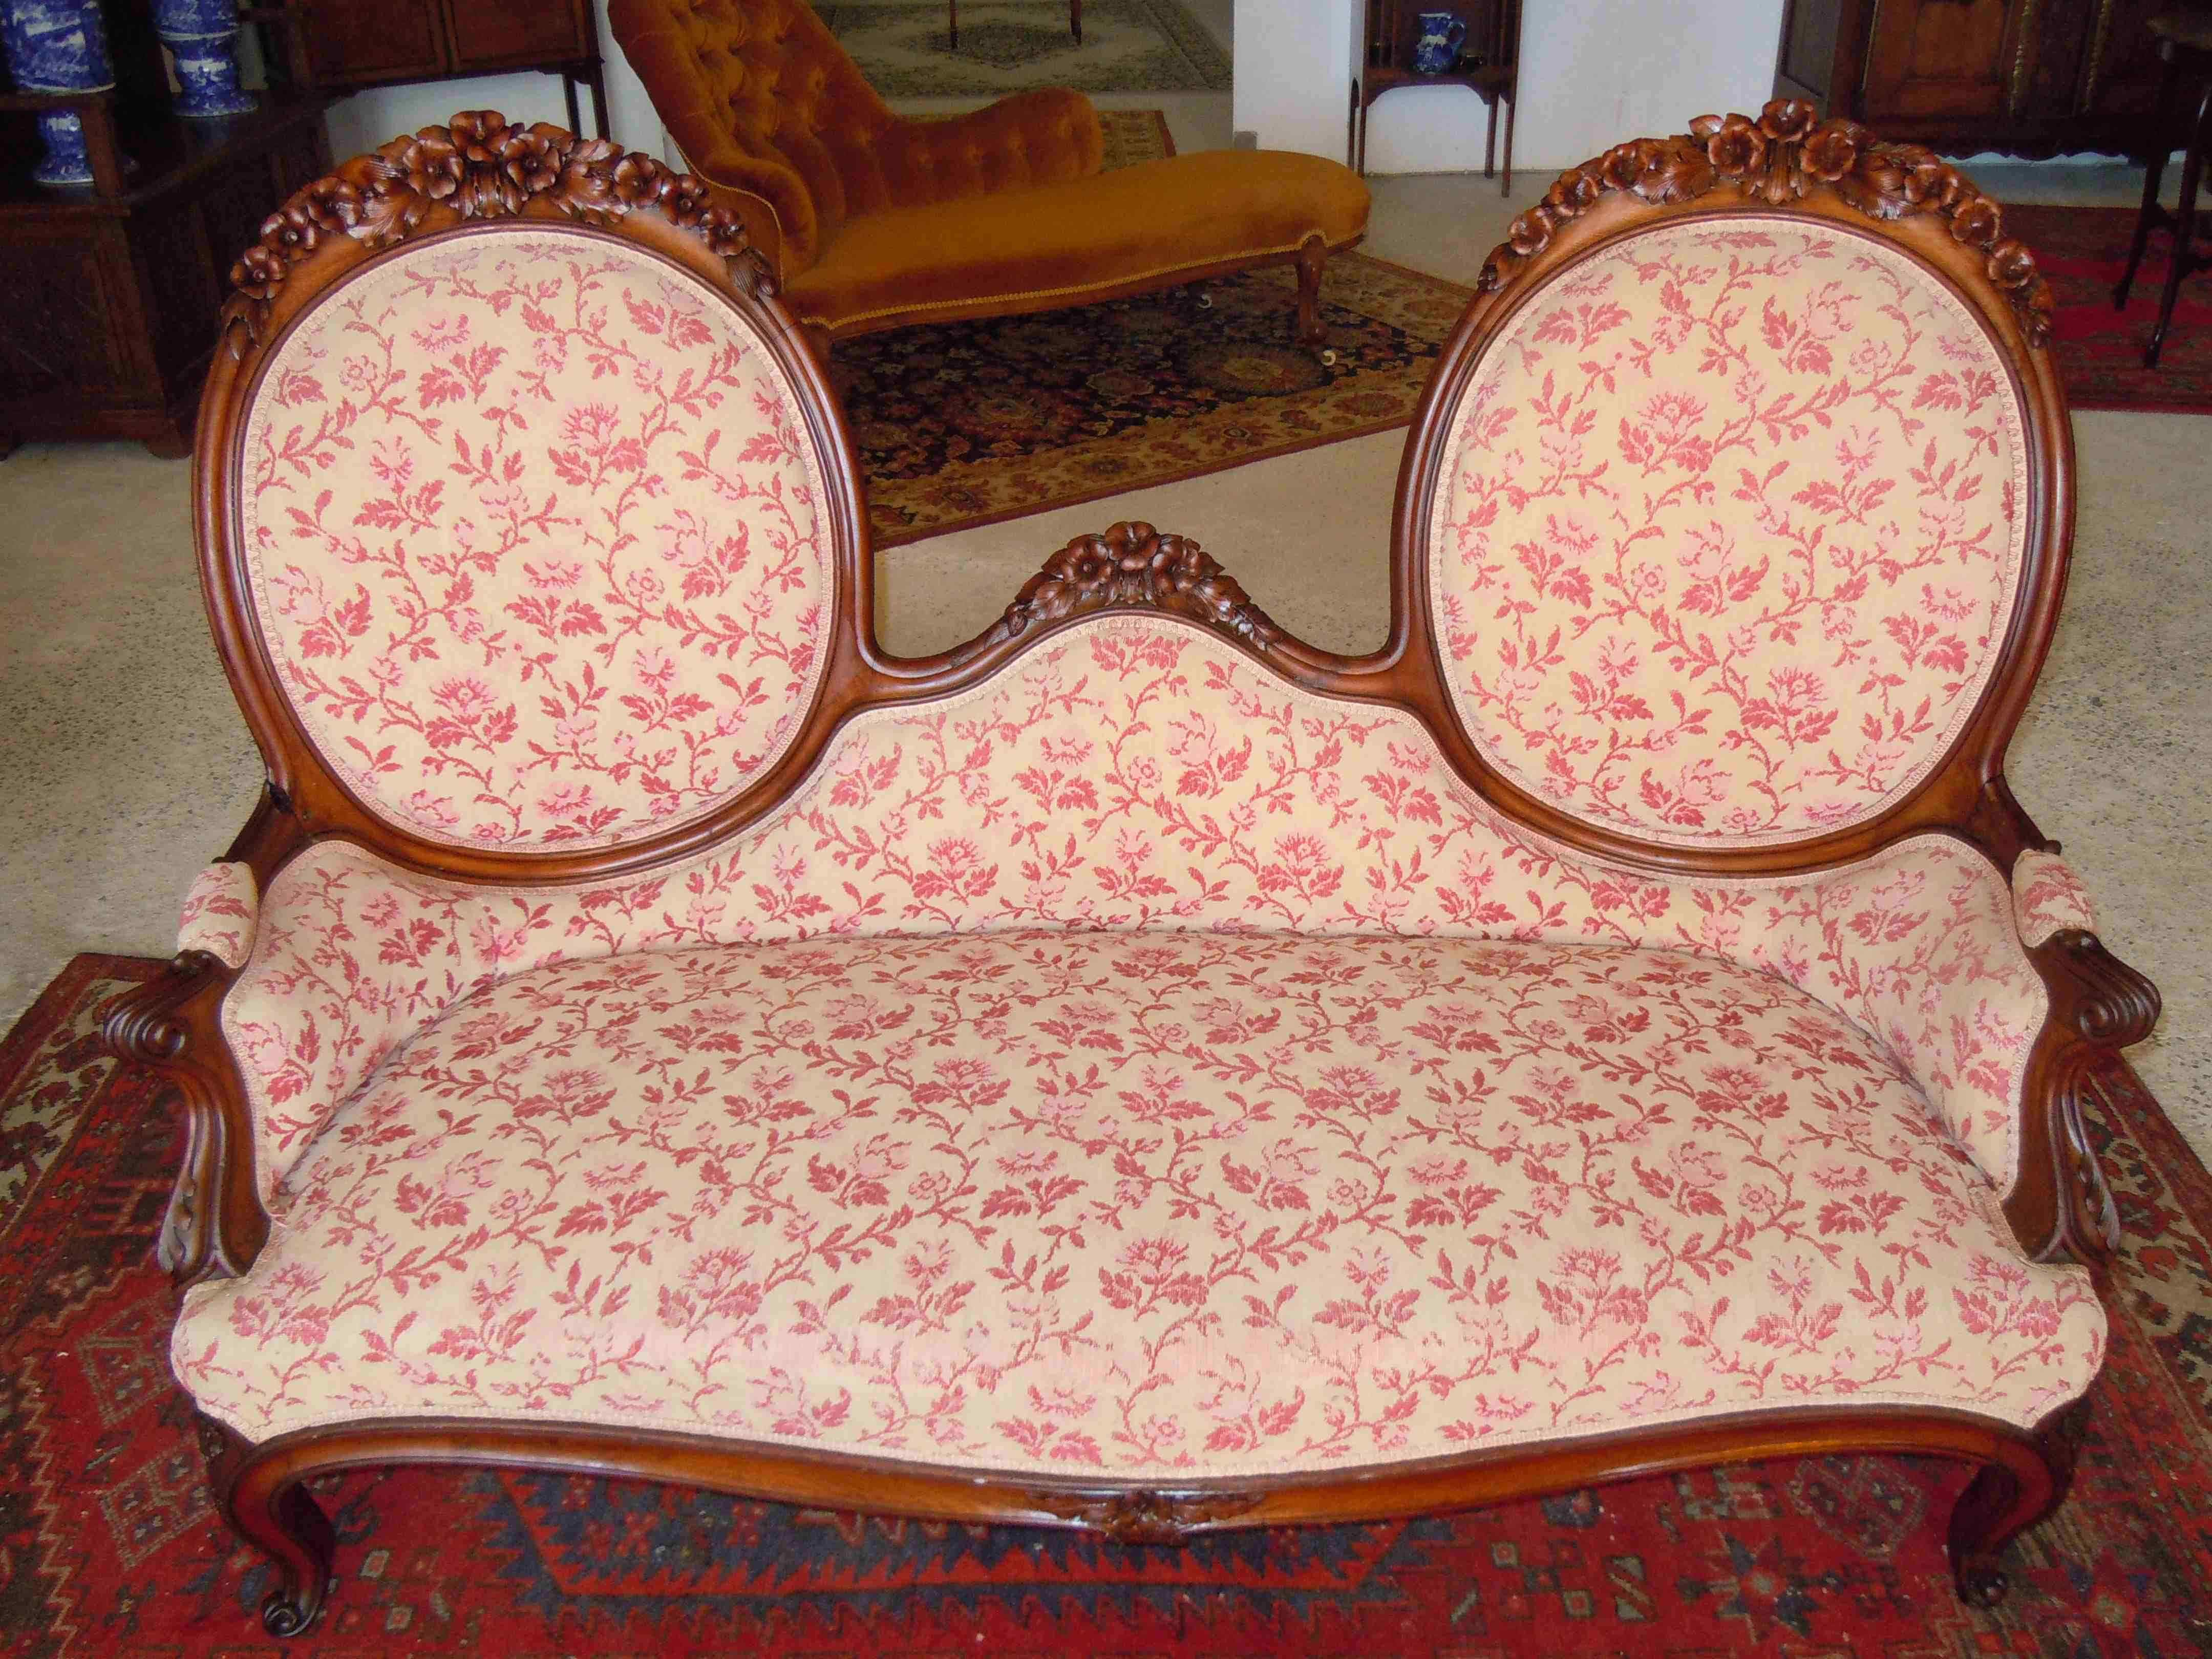 canap sofa poque napol on iii en bois sculpt 2 m daillons anticswiss. Black Bedroom Furniture Sets. Home Design Ideas